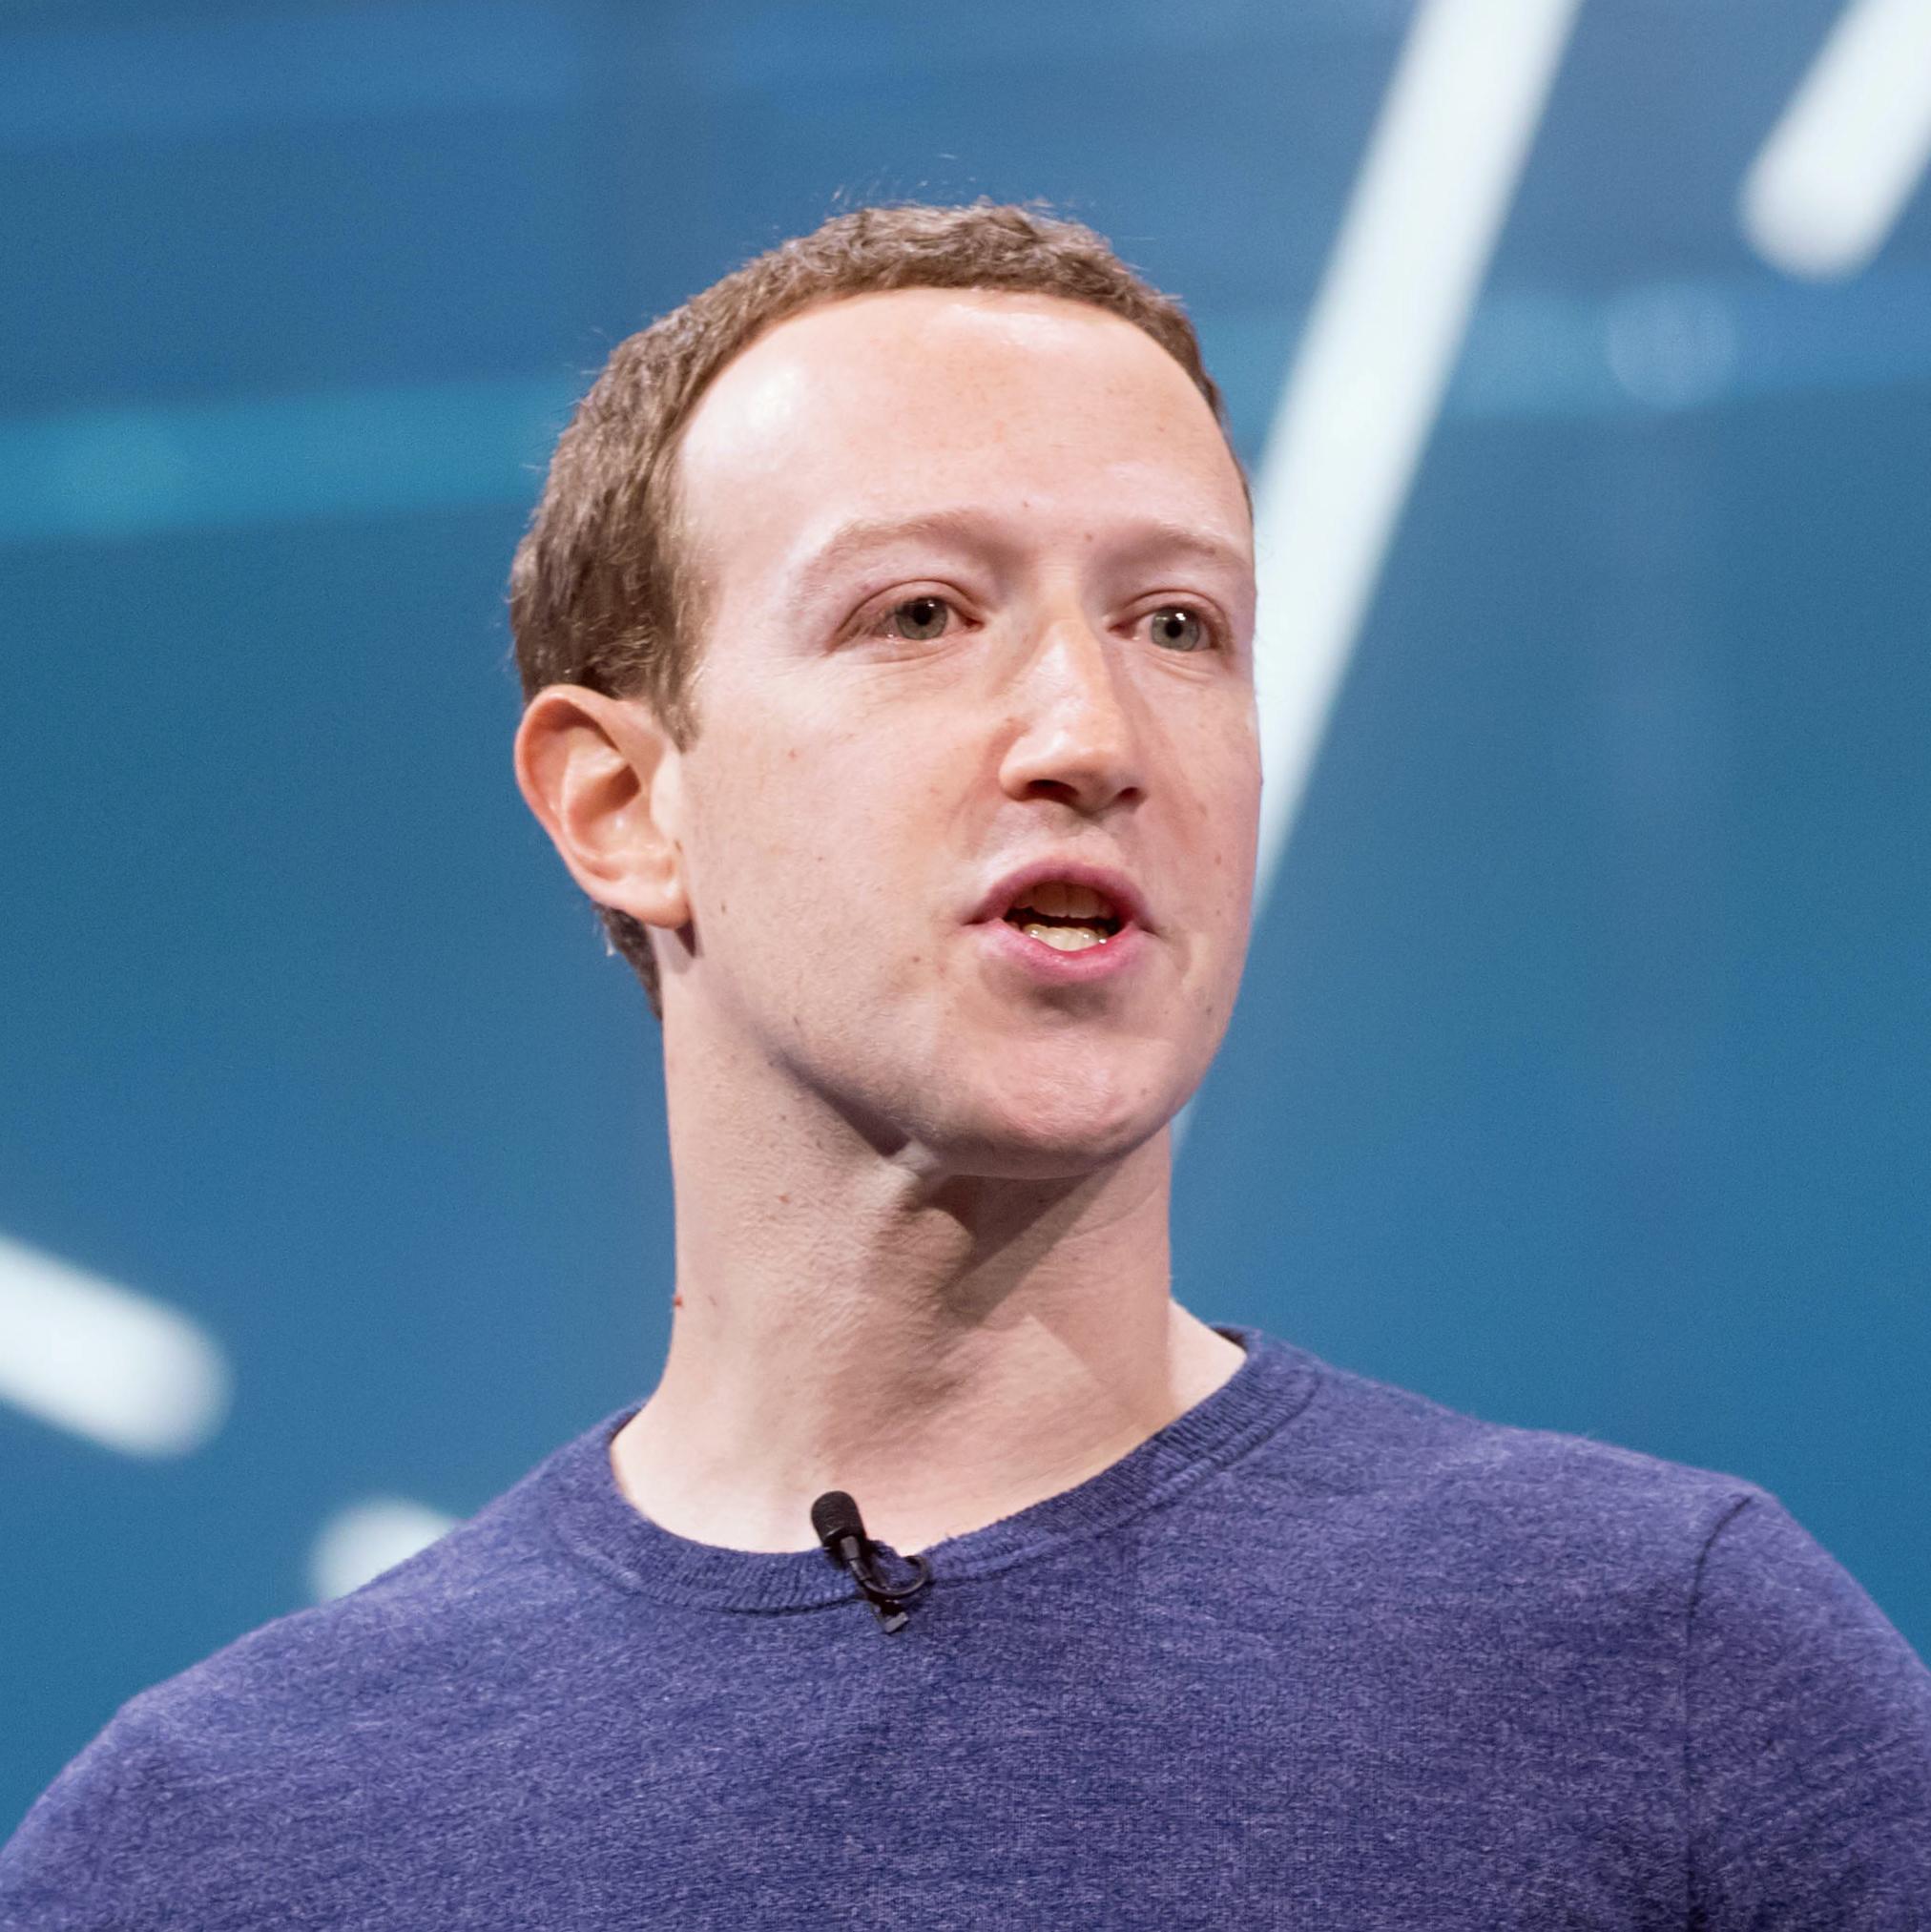 mark zuckerberg f8 2018 keynote (cropped).jpg